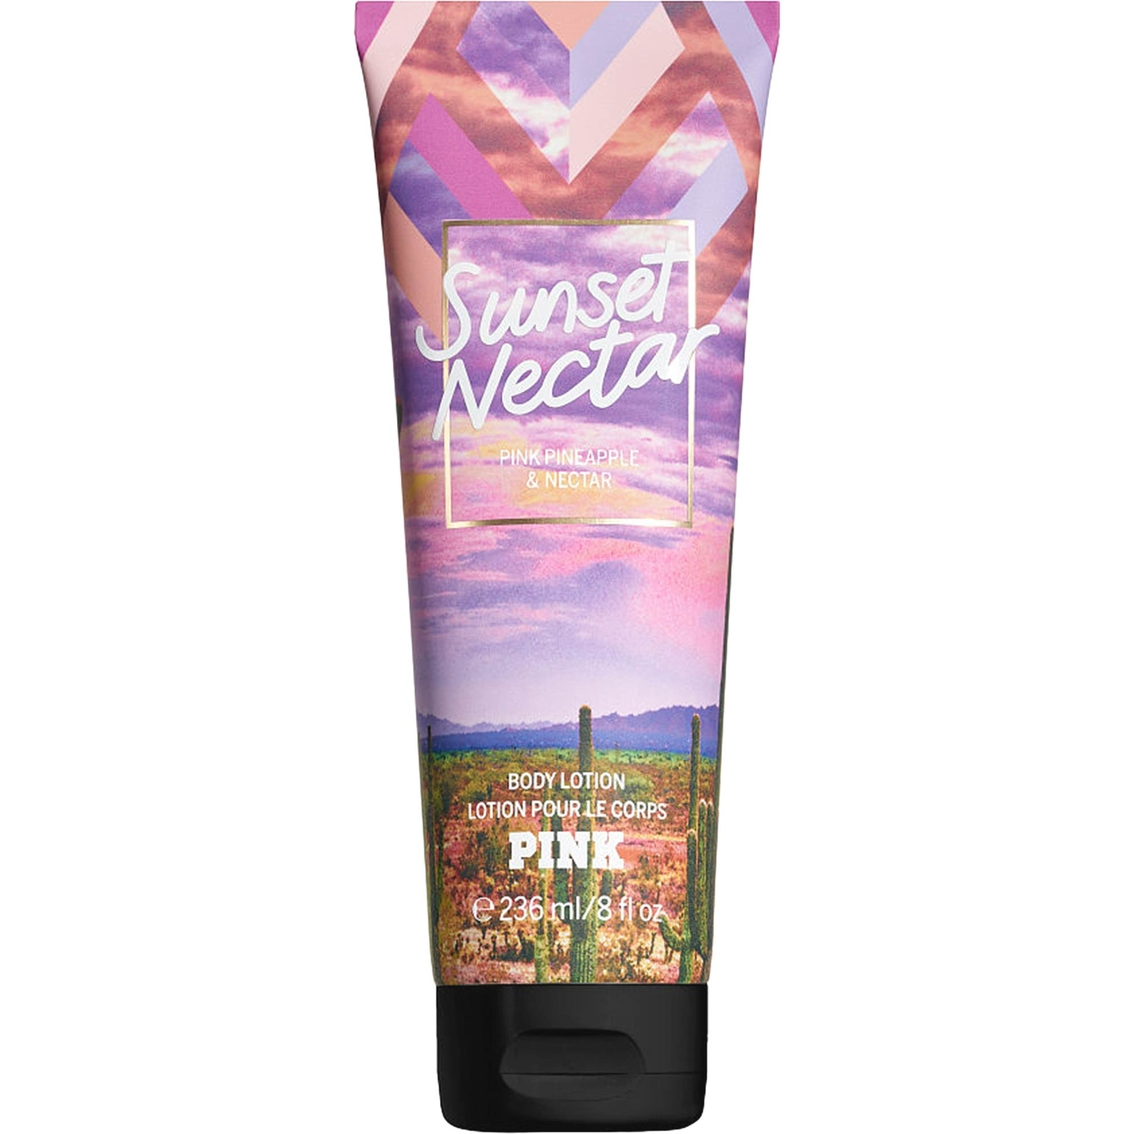 Victorias Secret Pink Sunset Nectar Fragrance Lotion 50 Off